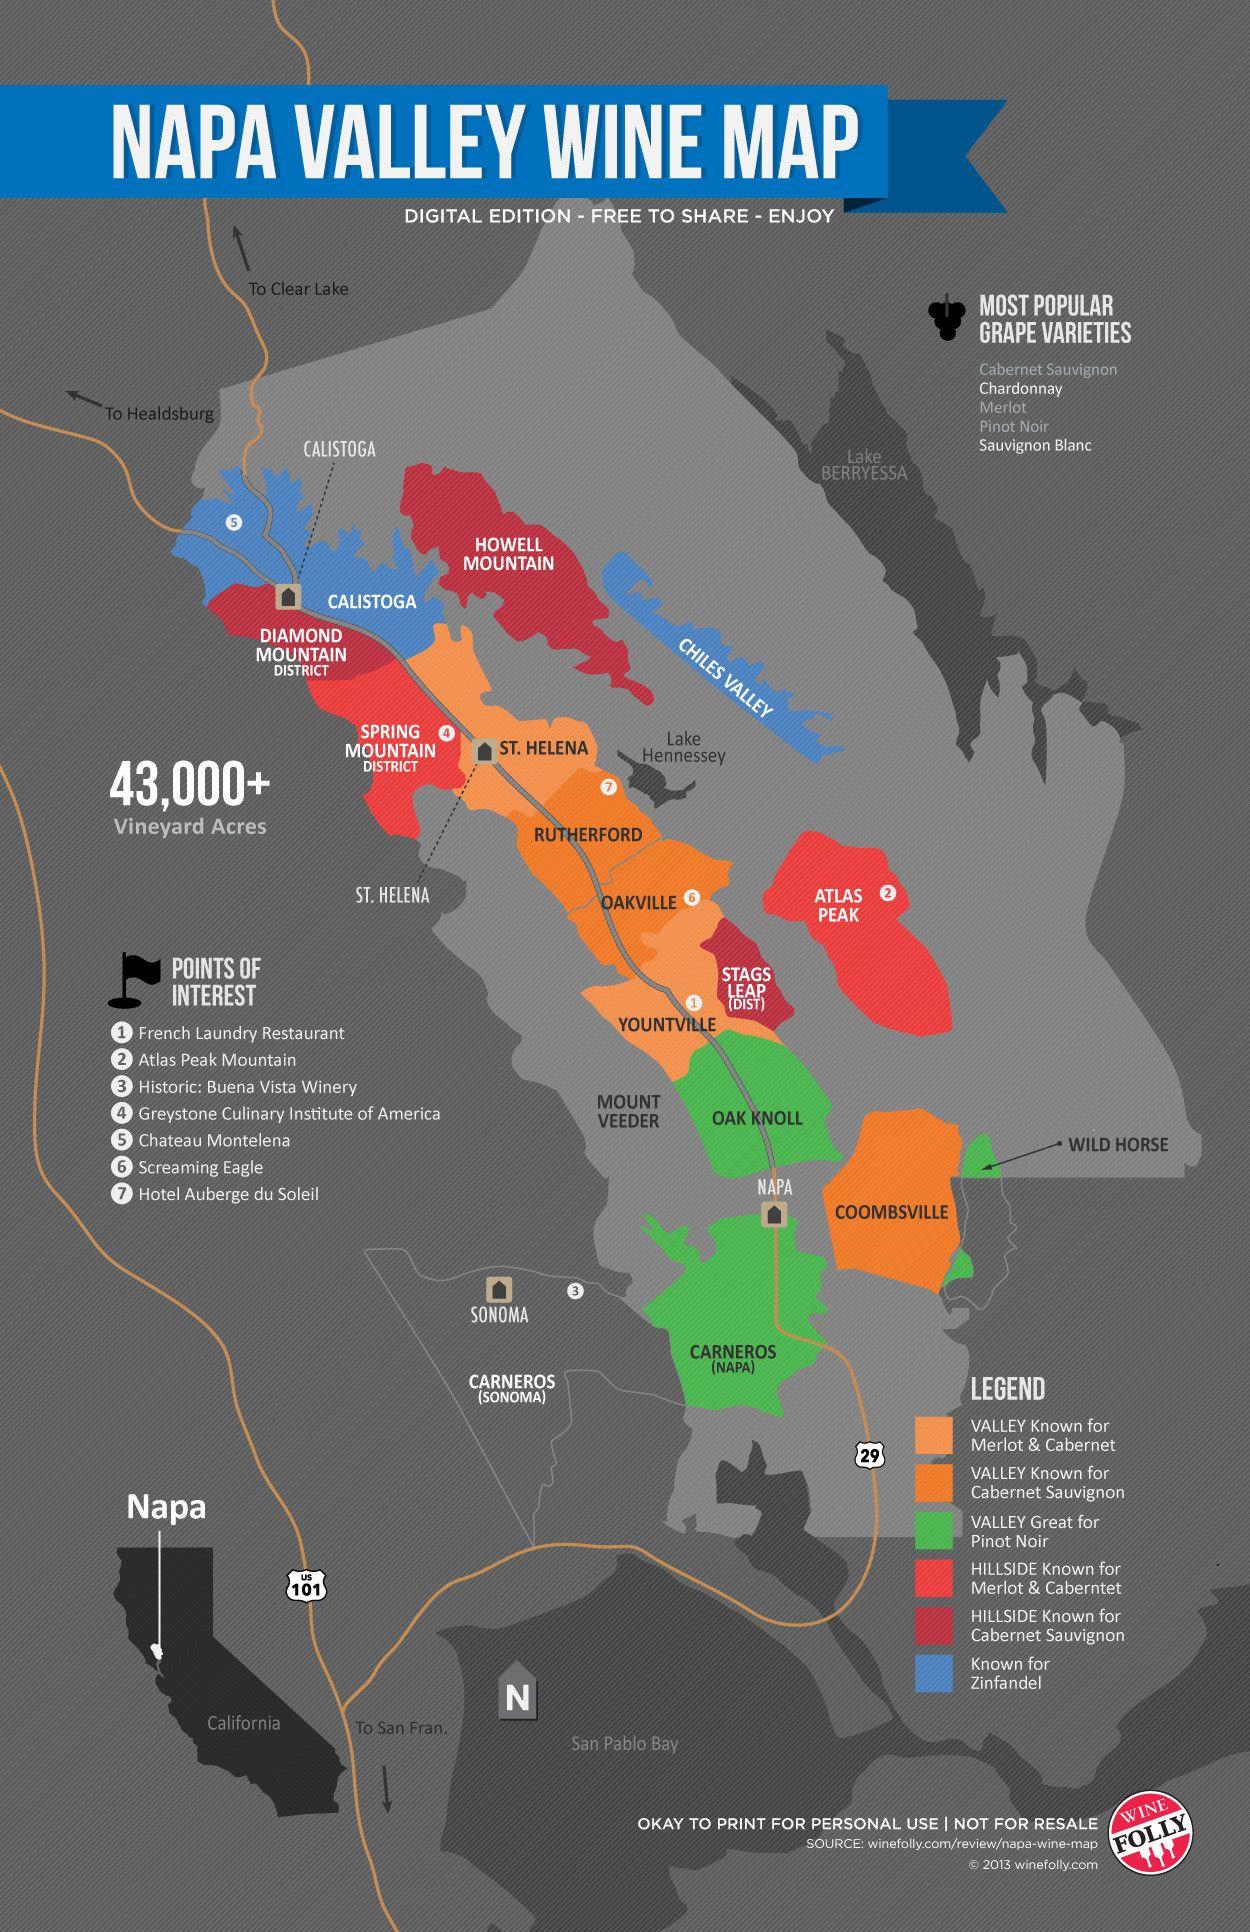 Napa Valley Wine Map Drinks Alcohol Pinterest Napa Valley - Napa valley vineyard map